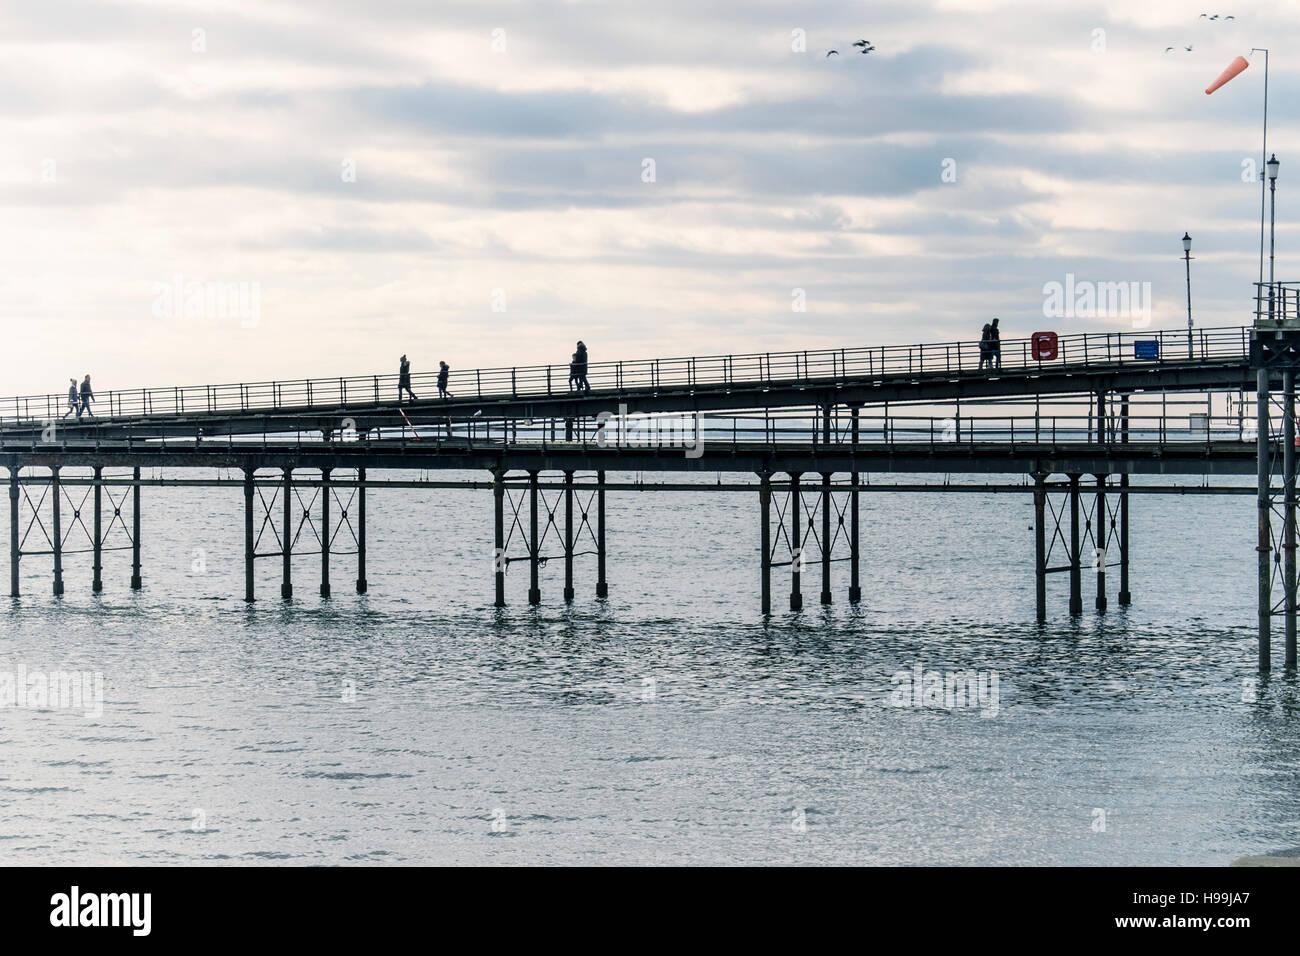 People walking on Southend Pier, the longest pleasure pier in the World. Southend-on-sea, Essex,England - Stock Image